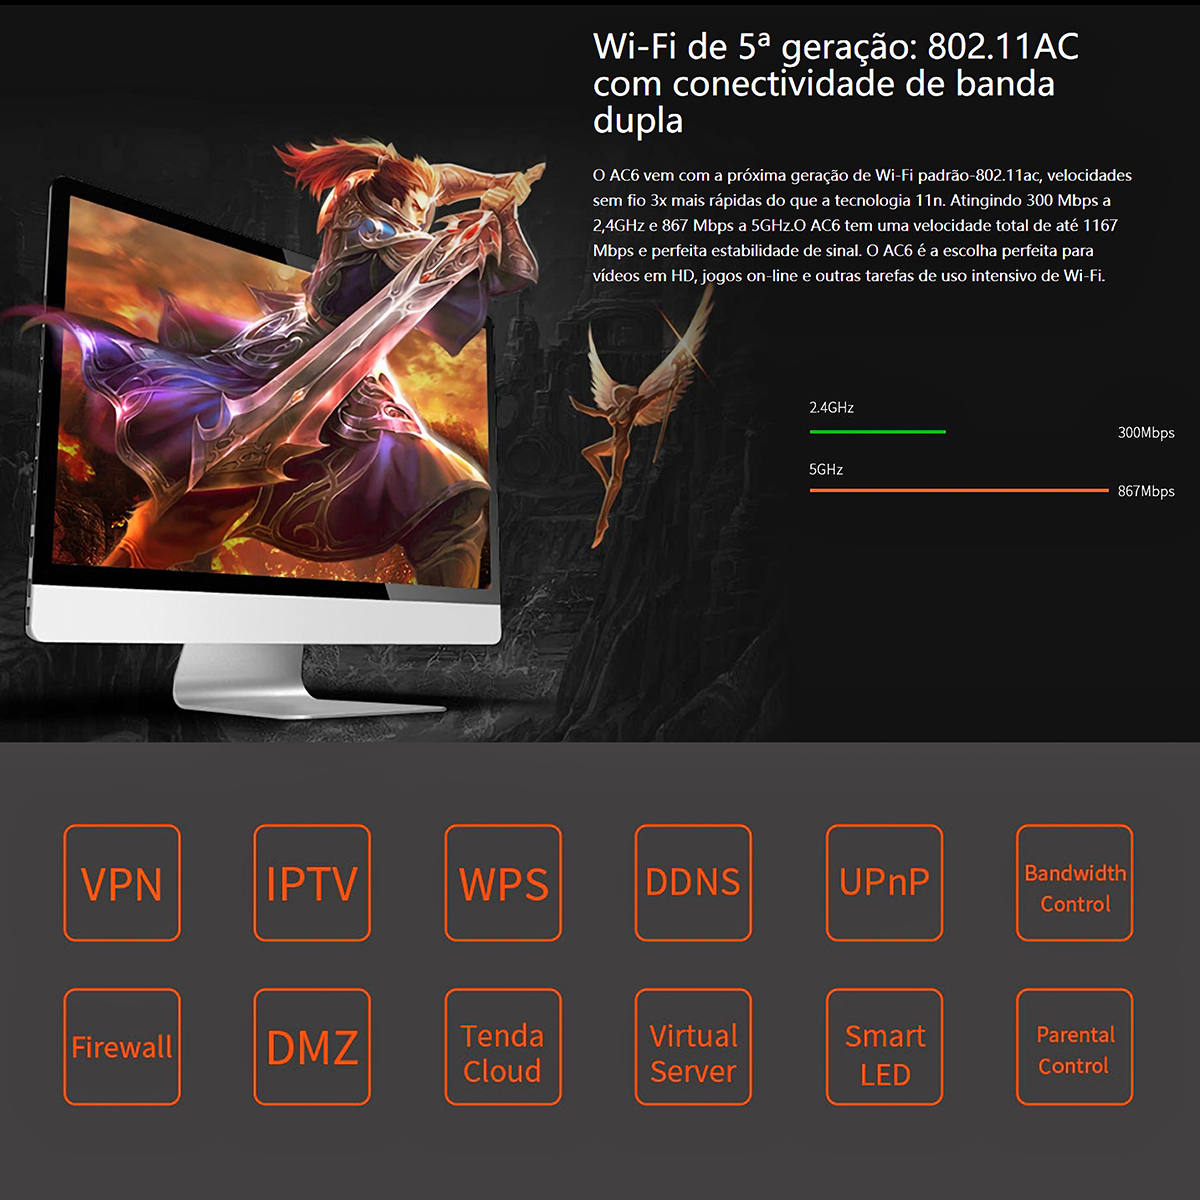 Roteador Inteligente AC1200 Sem Fio Dual Band Wi-Fi 1200Mpbs 4 Antenas High Power Tenda Wireless AC6